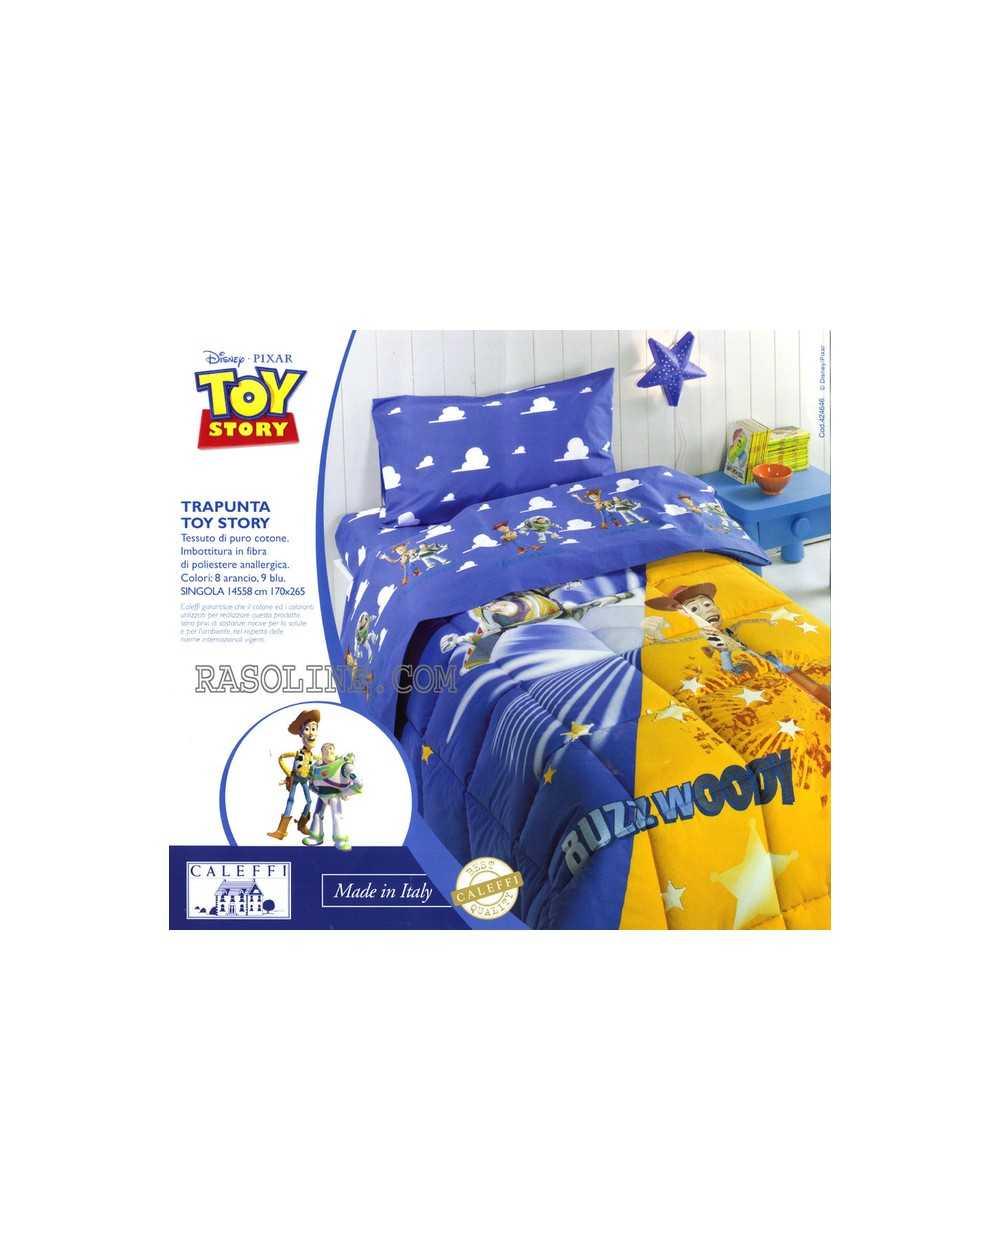 Copripiumino Toy Story.51defli9gniiom